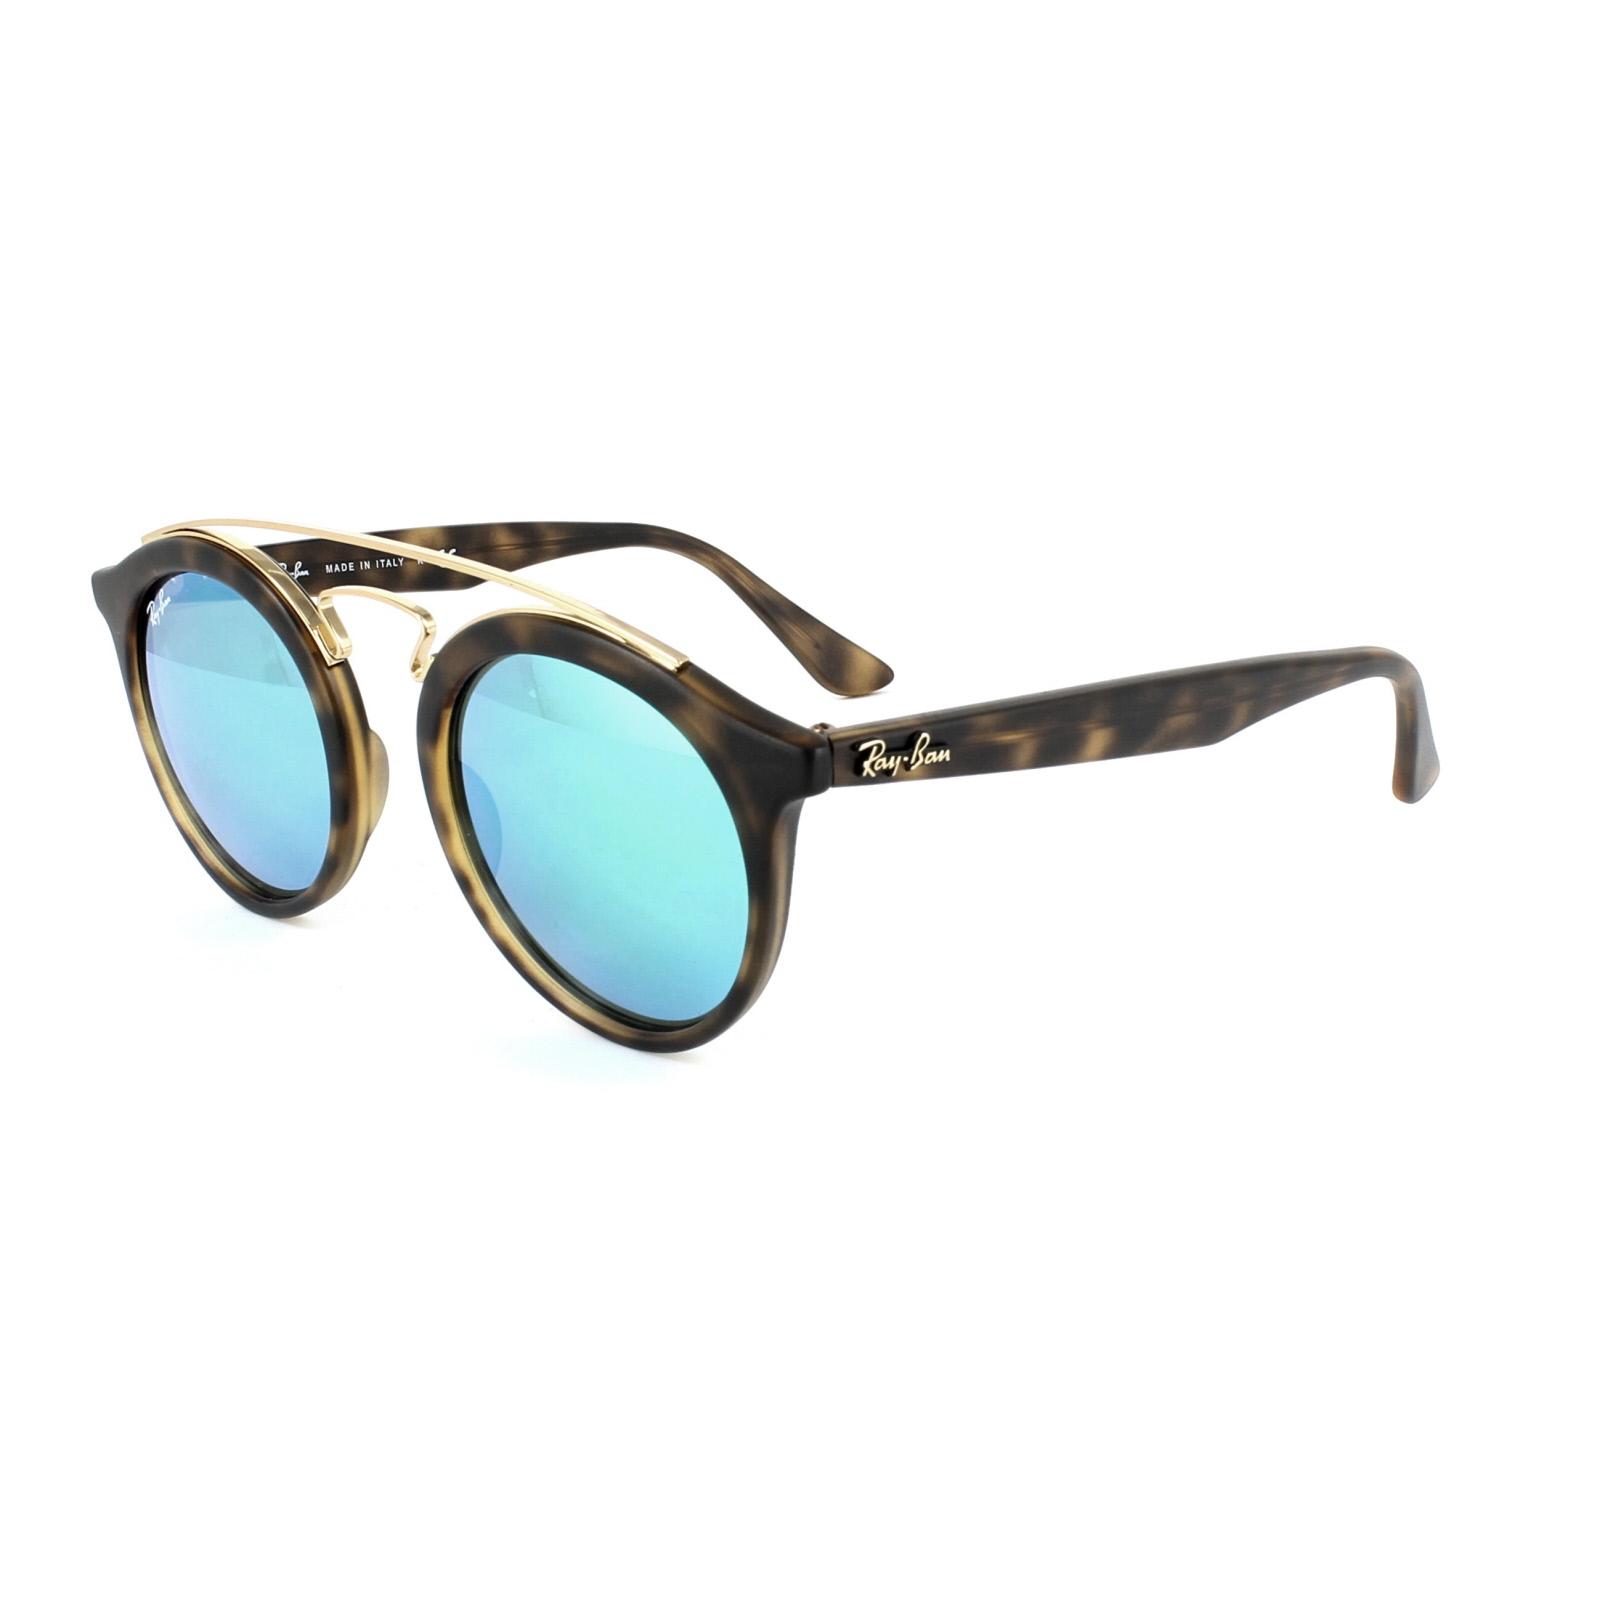 Sentinel Ray-Ban Sunglasses Gatsby 4256 60923R Matt Havana Green Mirror b70d19749a75